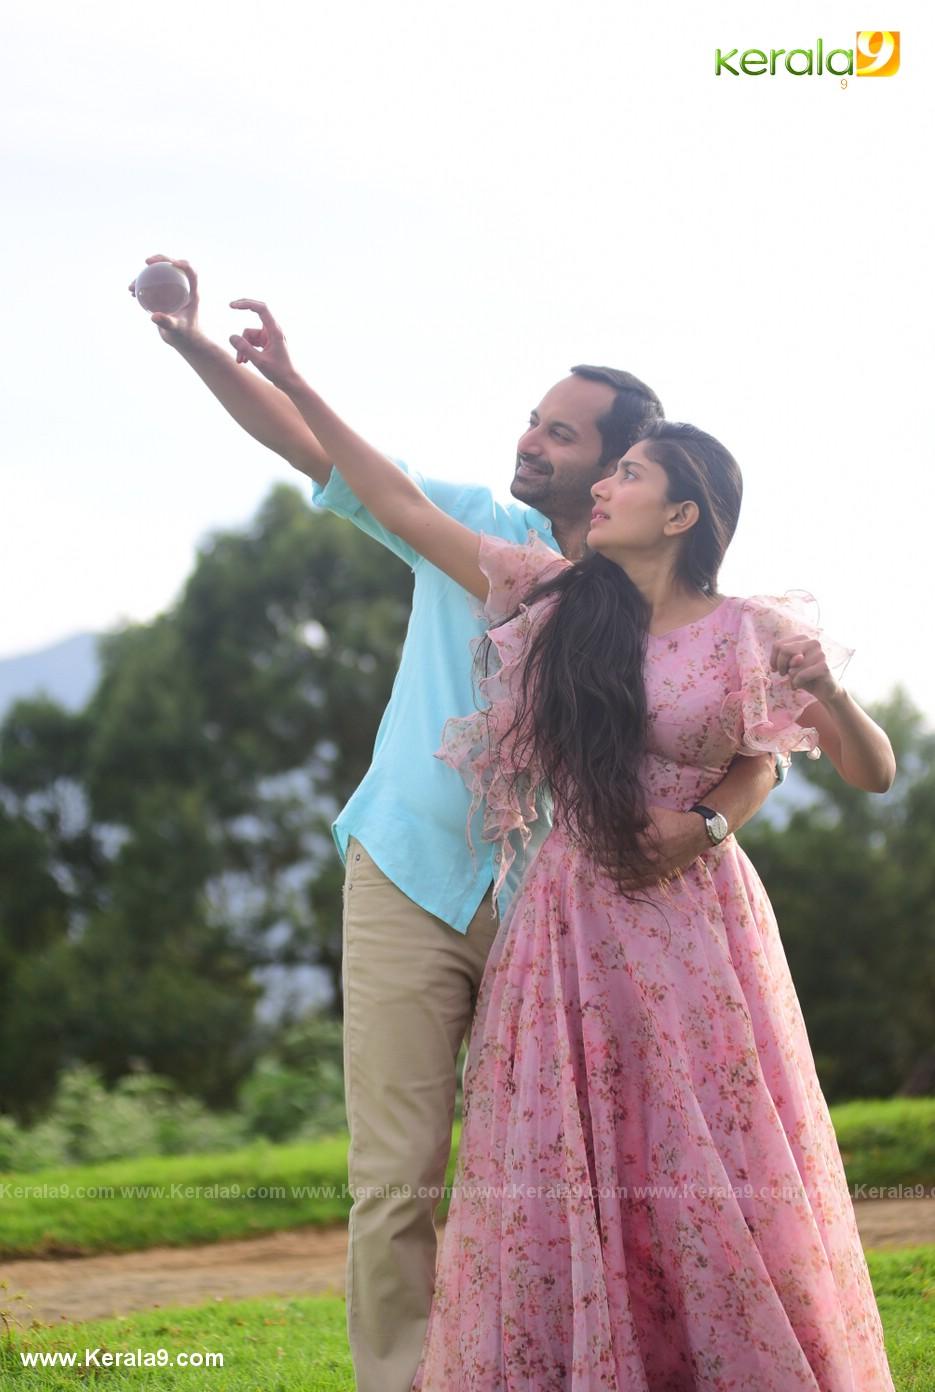 athiran malayalam movie stills 4 - Kerala9.com